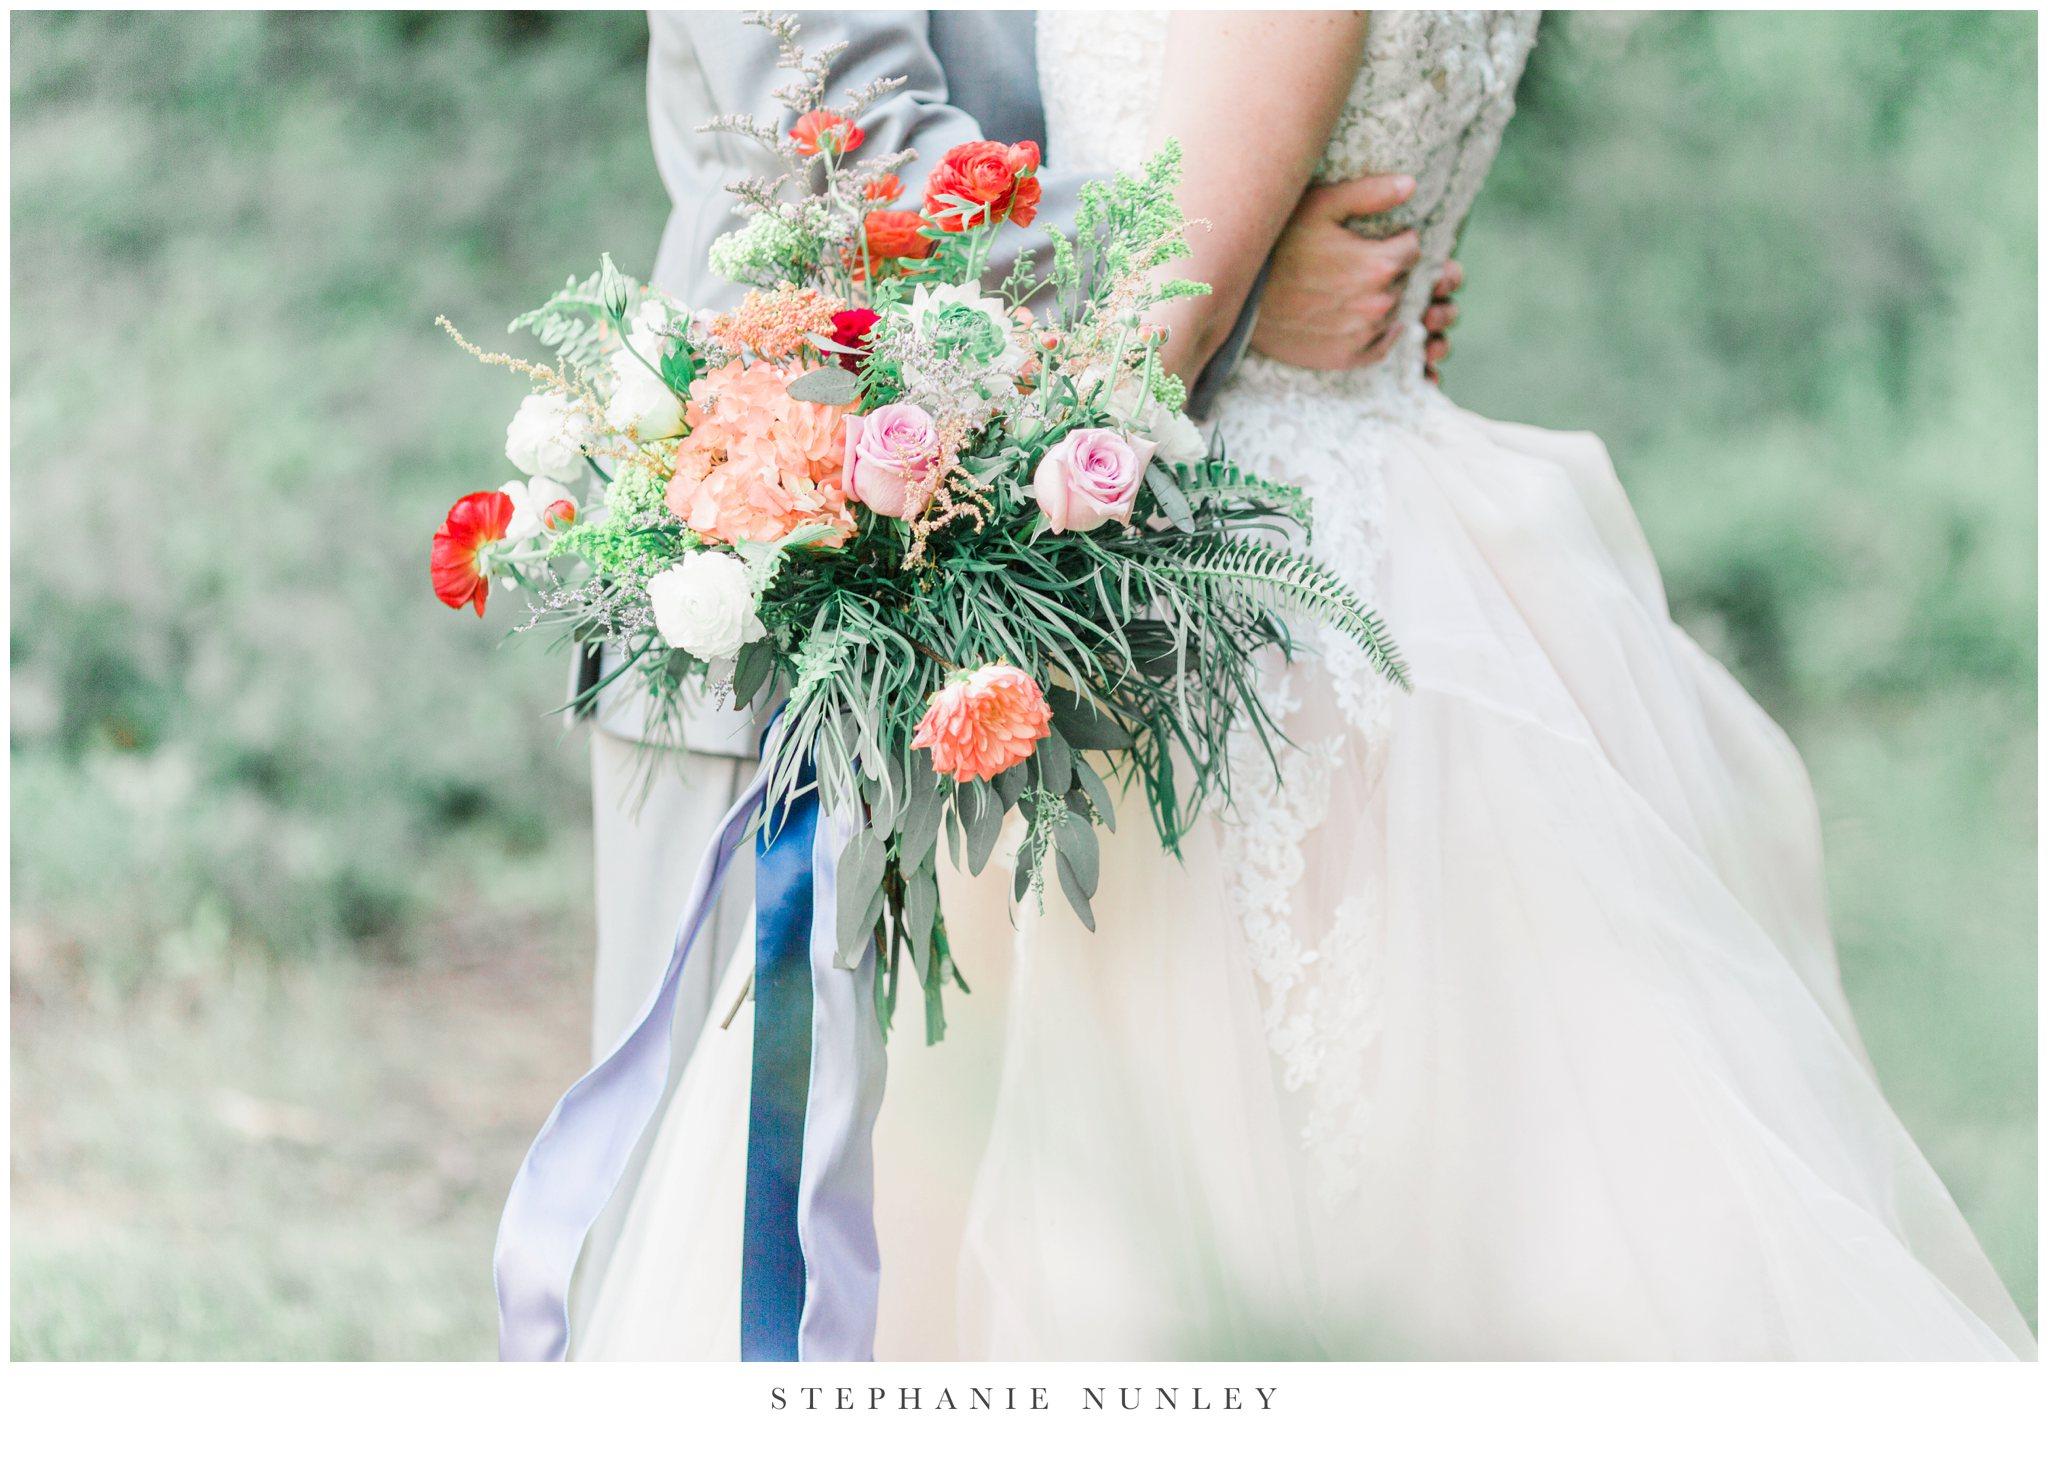 arkansas-wedding-with-lush-wildflower-bouquet-0122.jpg